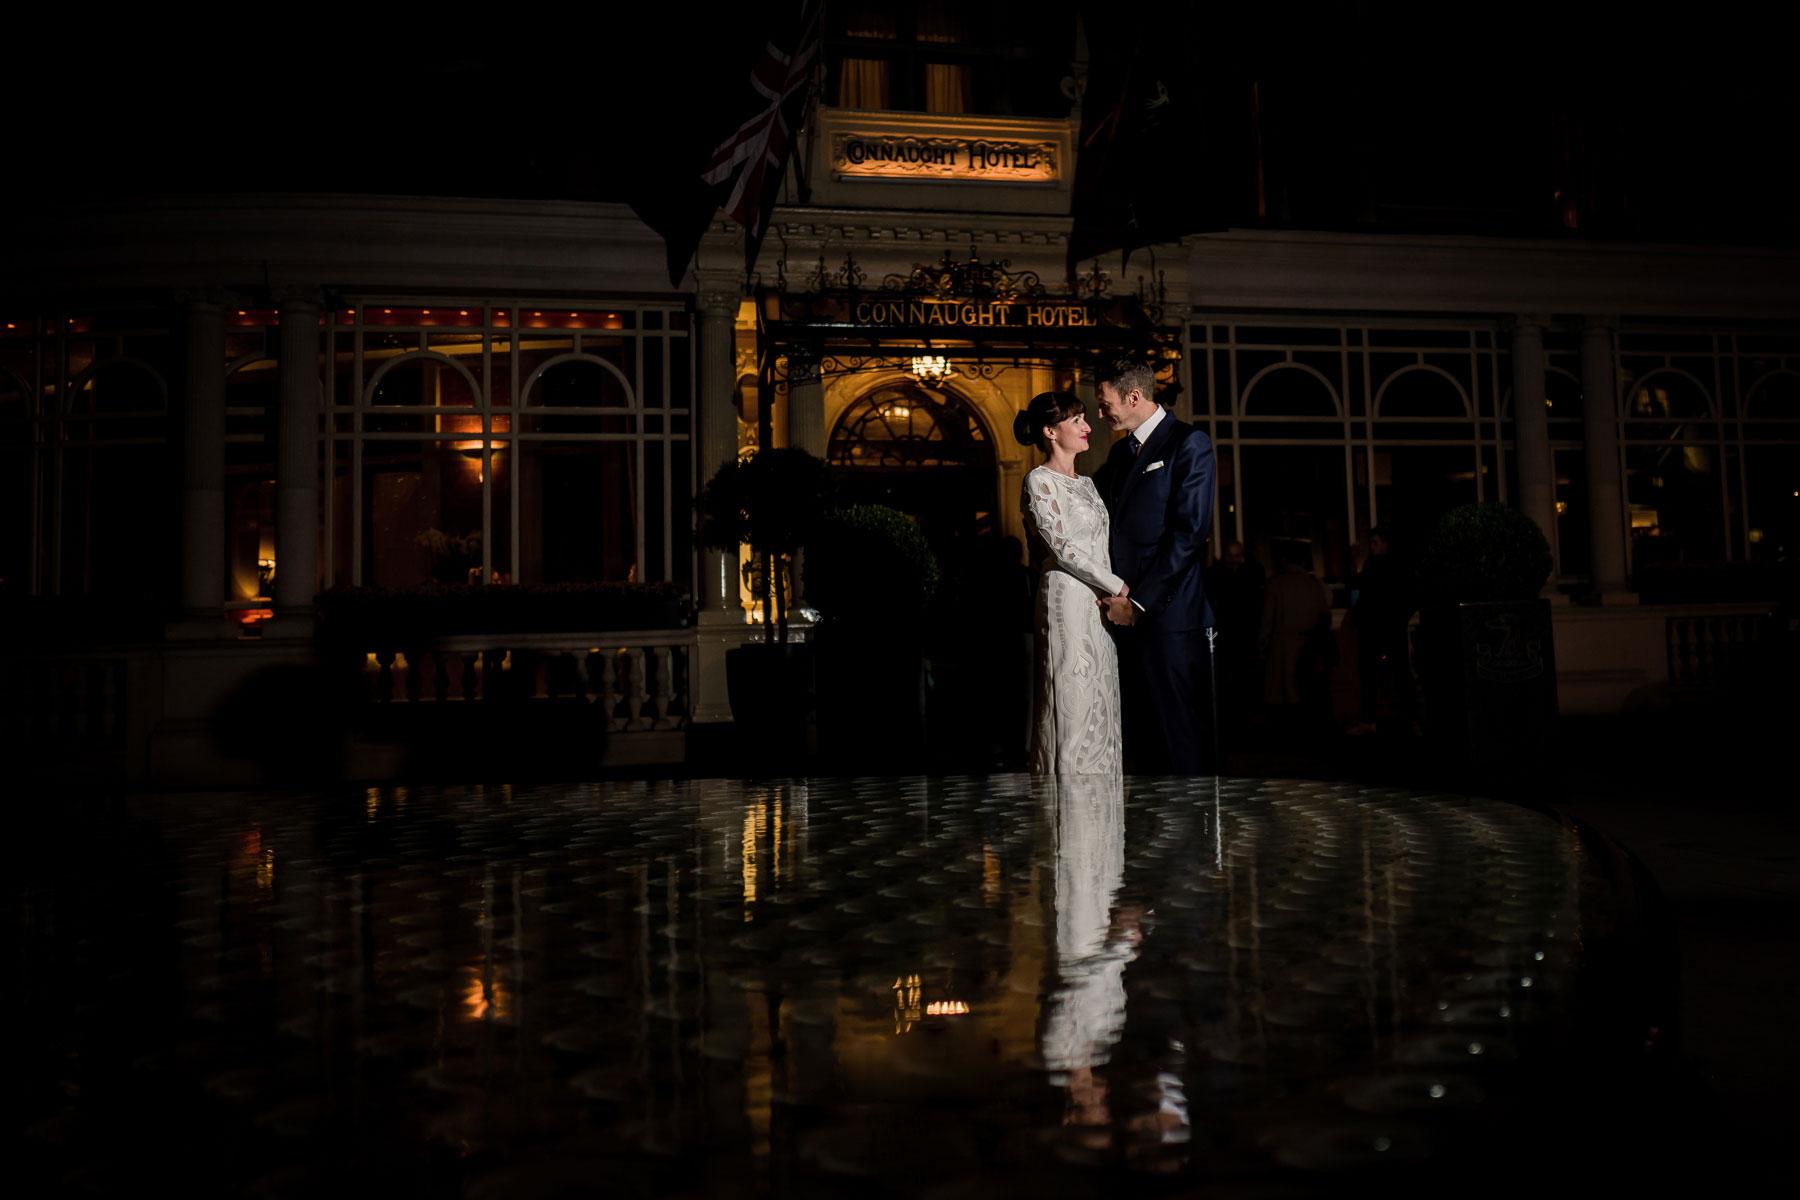 connaught-hotel-wedding-0047